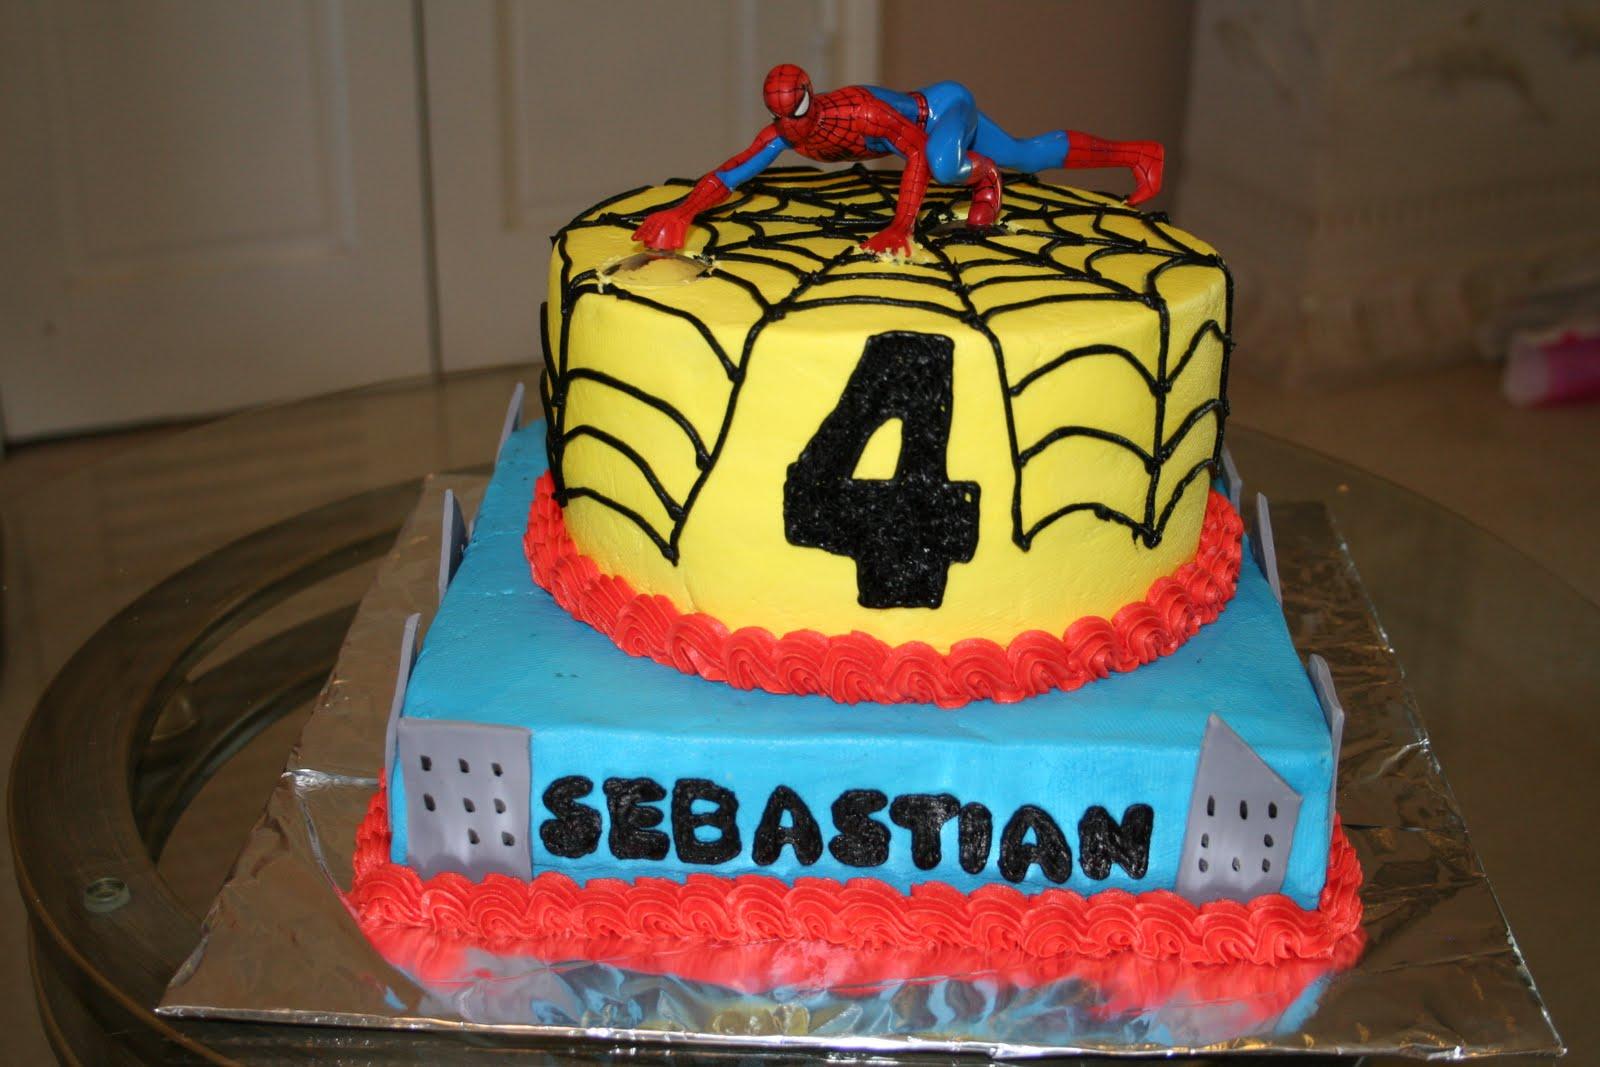 Number 8 Cake Decorating Ideas